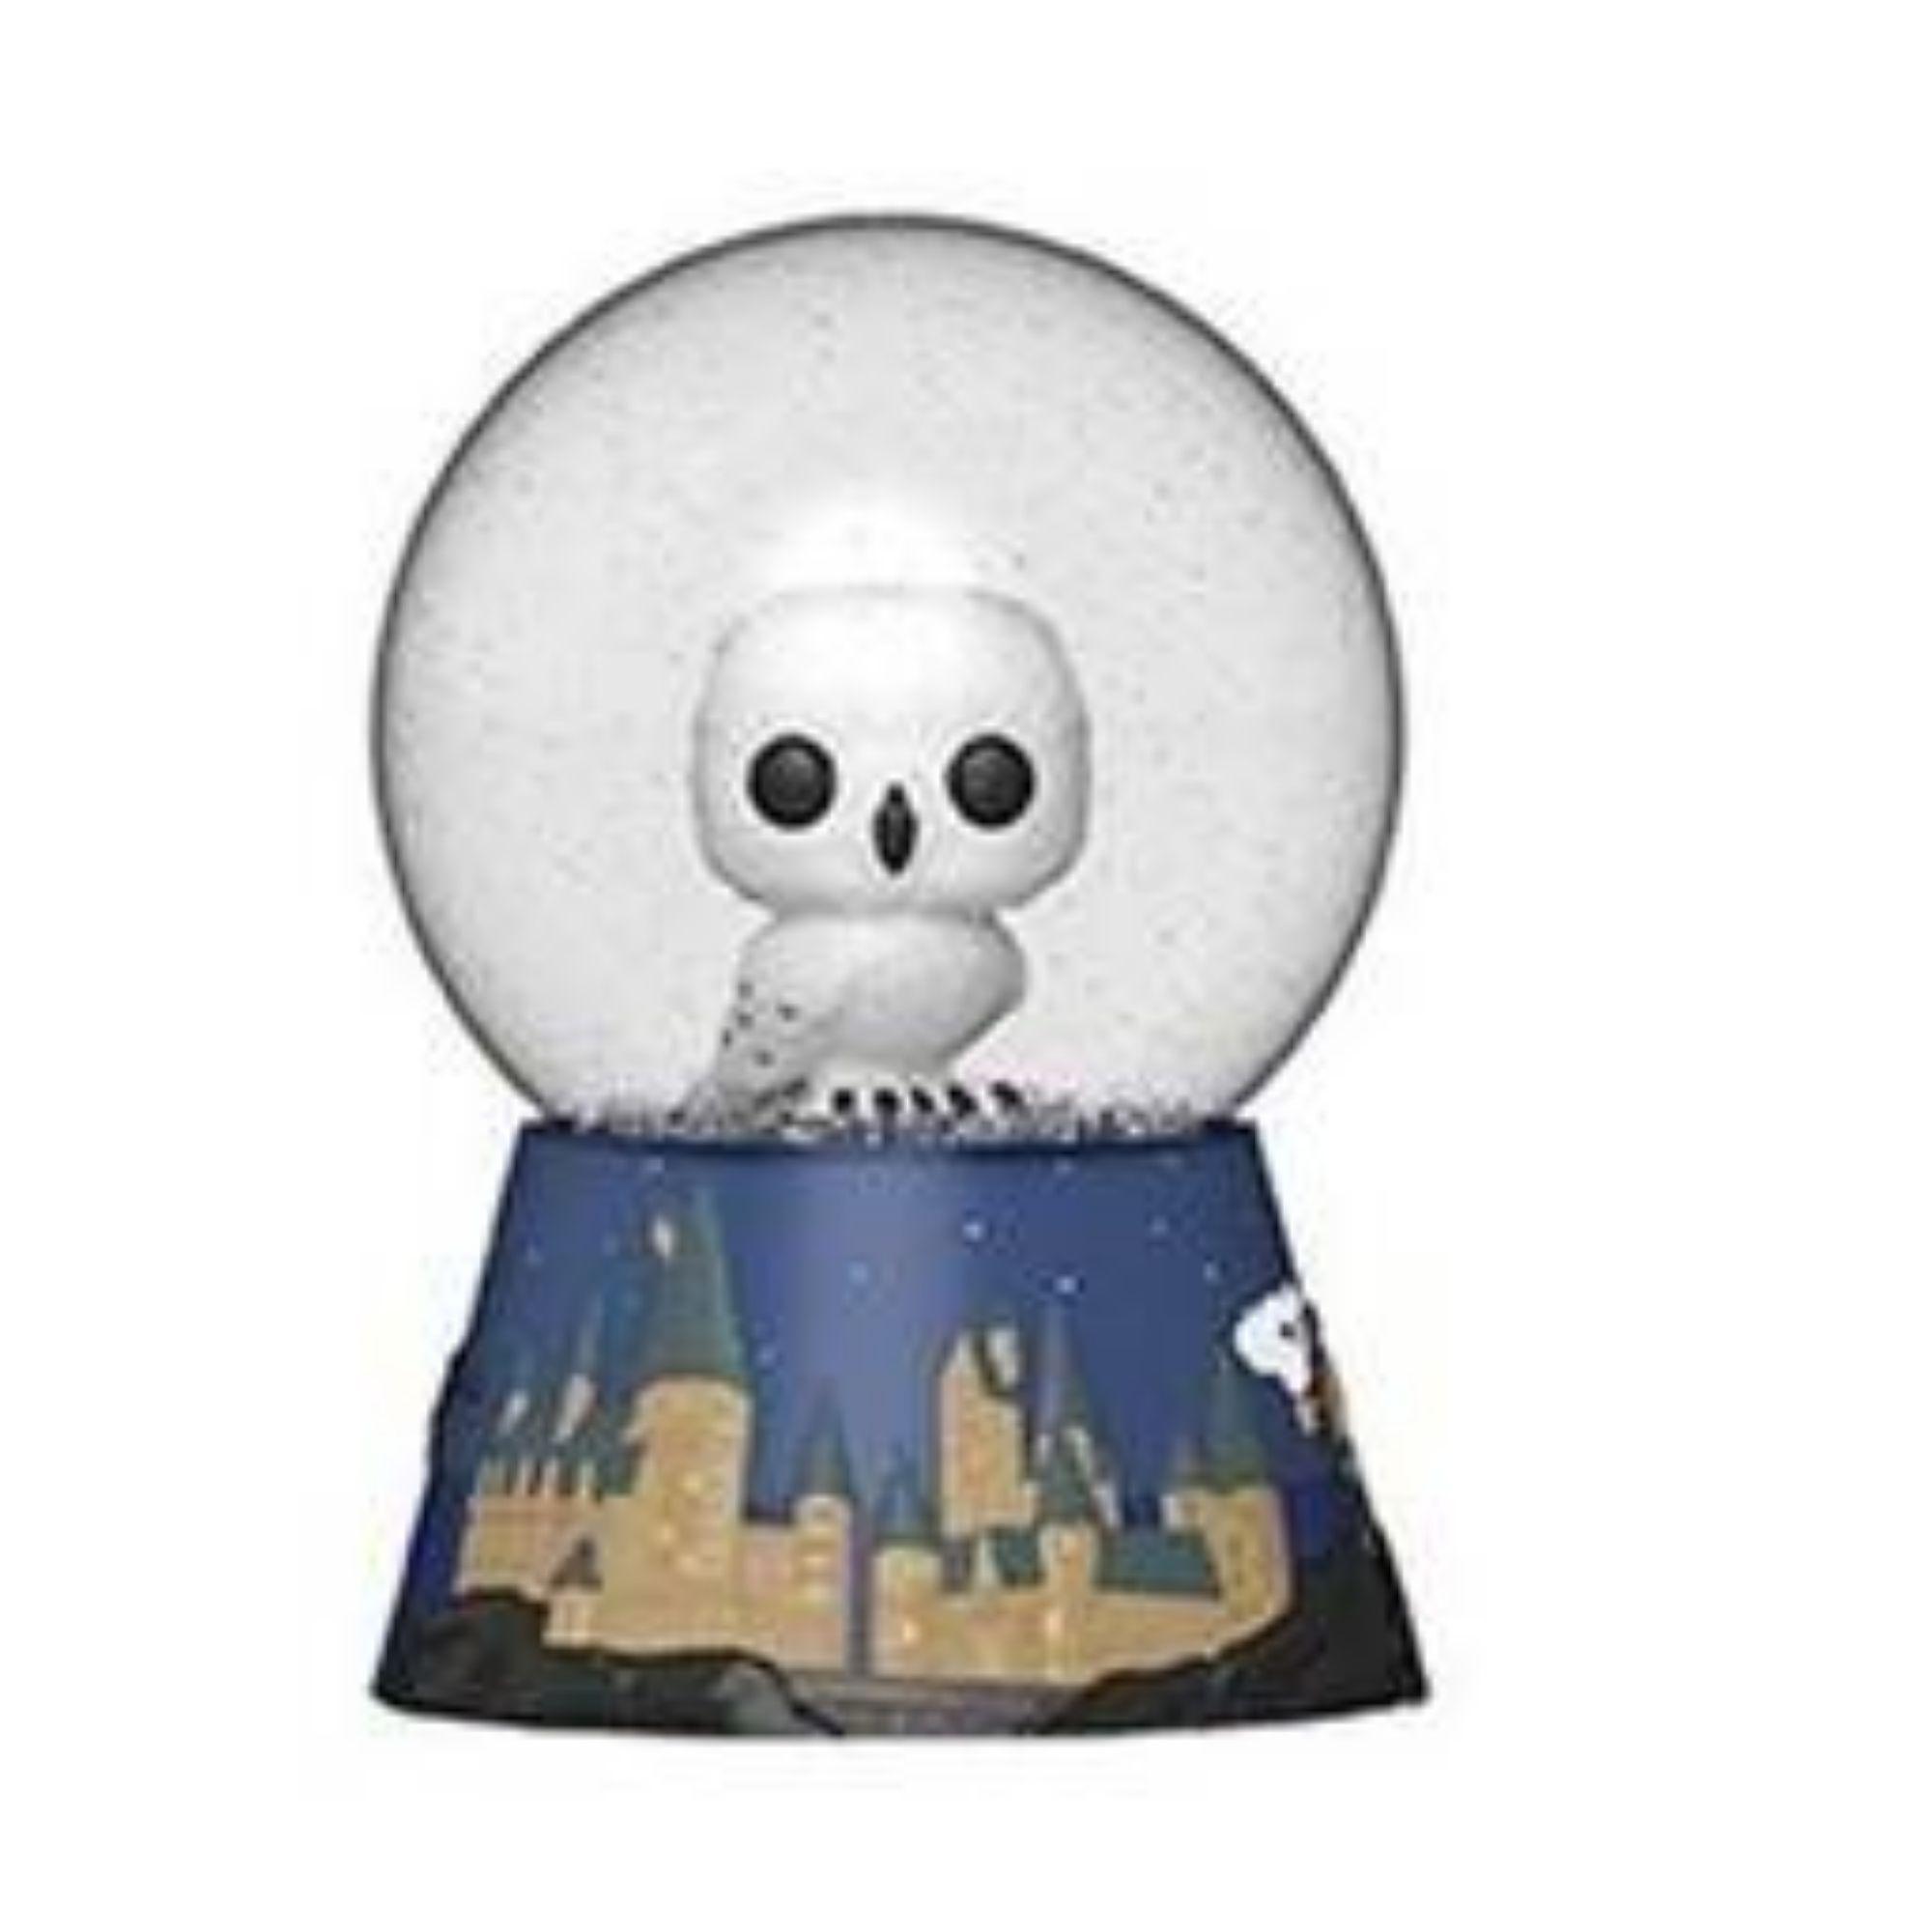 Mini Mystery Funko Snow Globe Harry Potter Hedwig  - Game Land Brinquedos